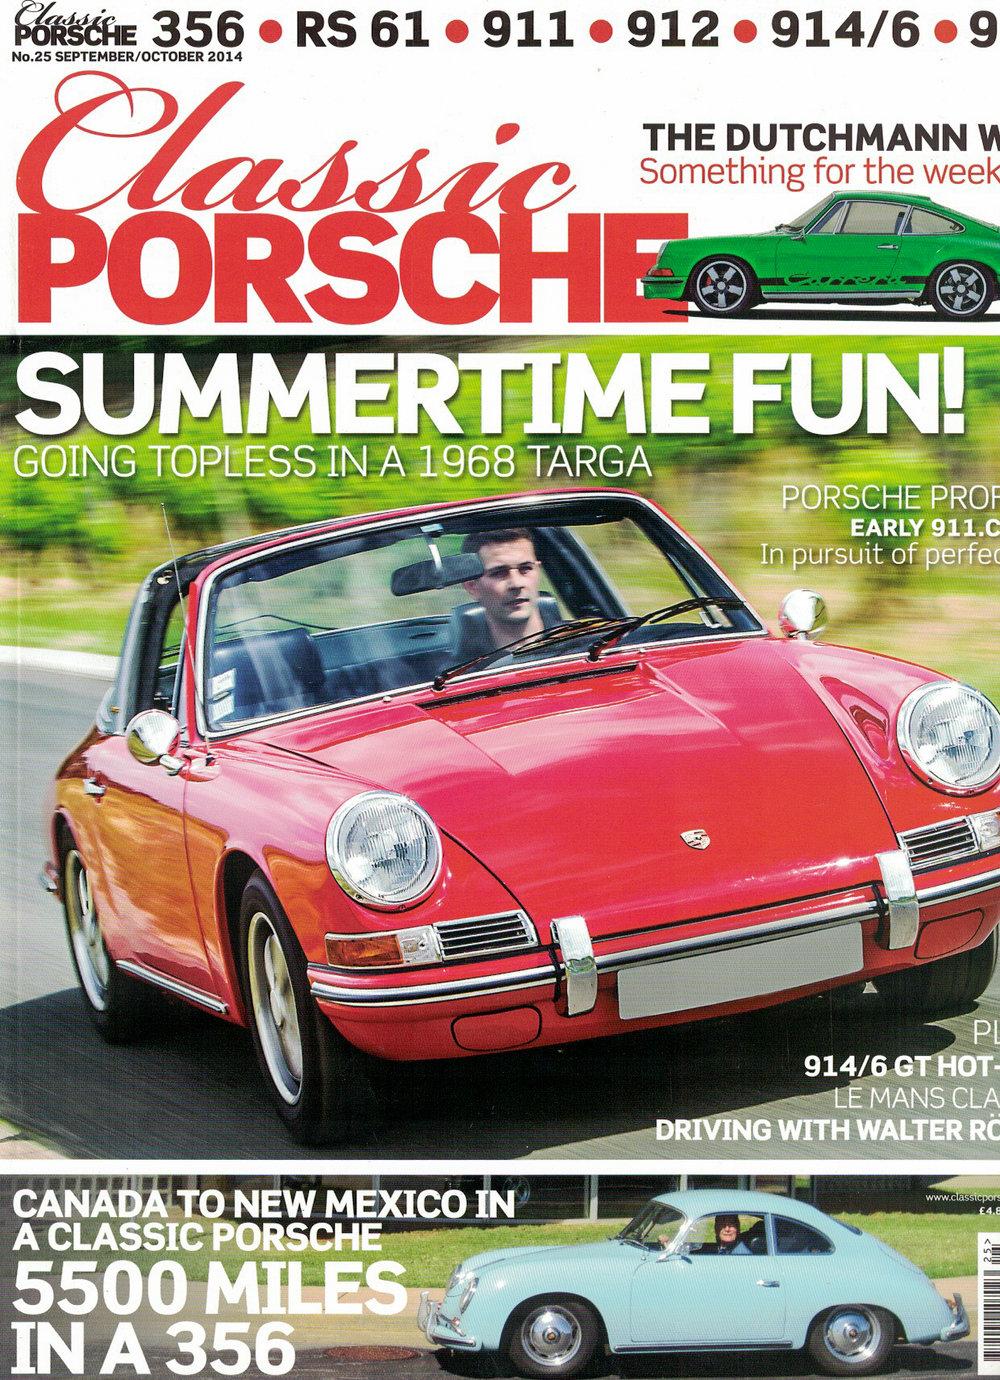 1973 Porsche 914-6 GT Magazine Cover-1.jpg